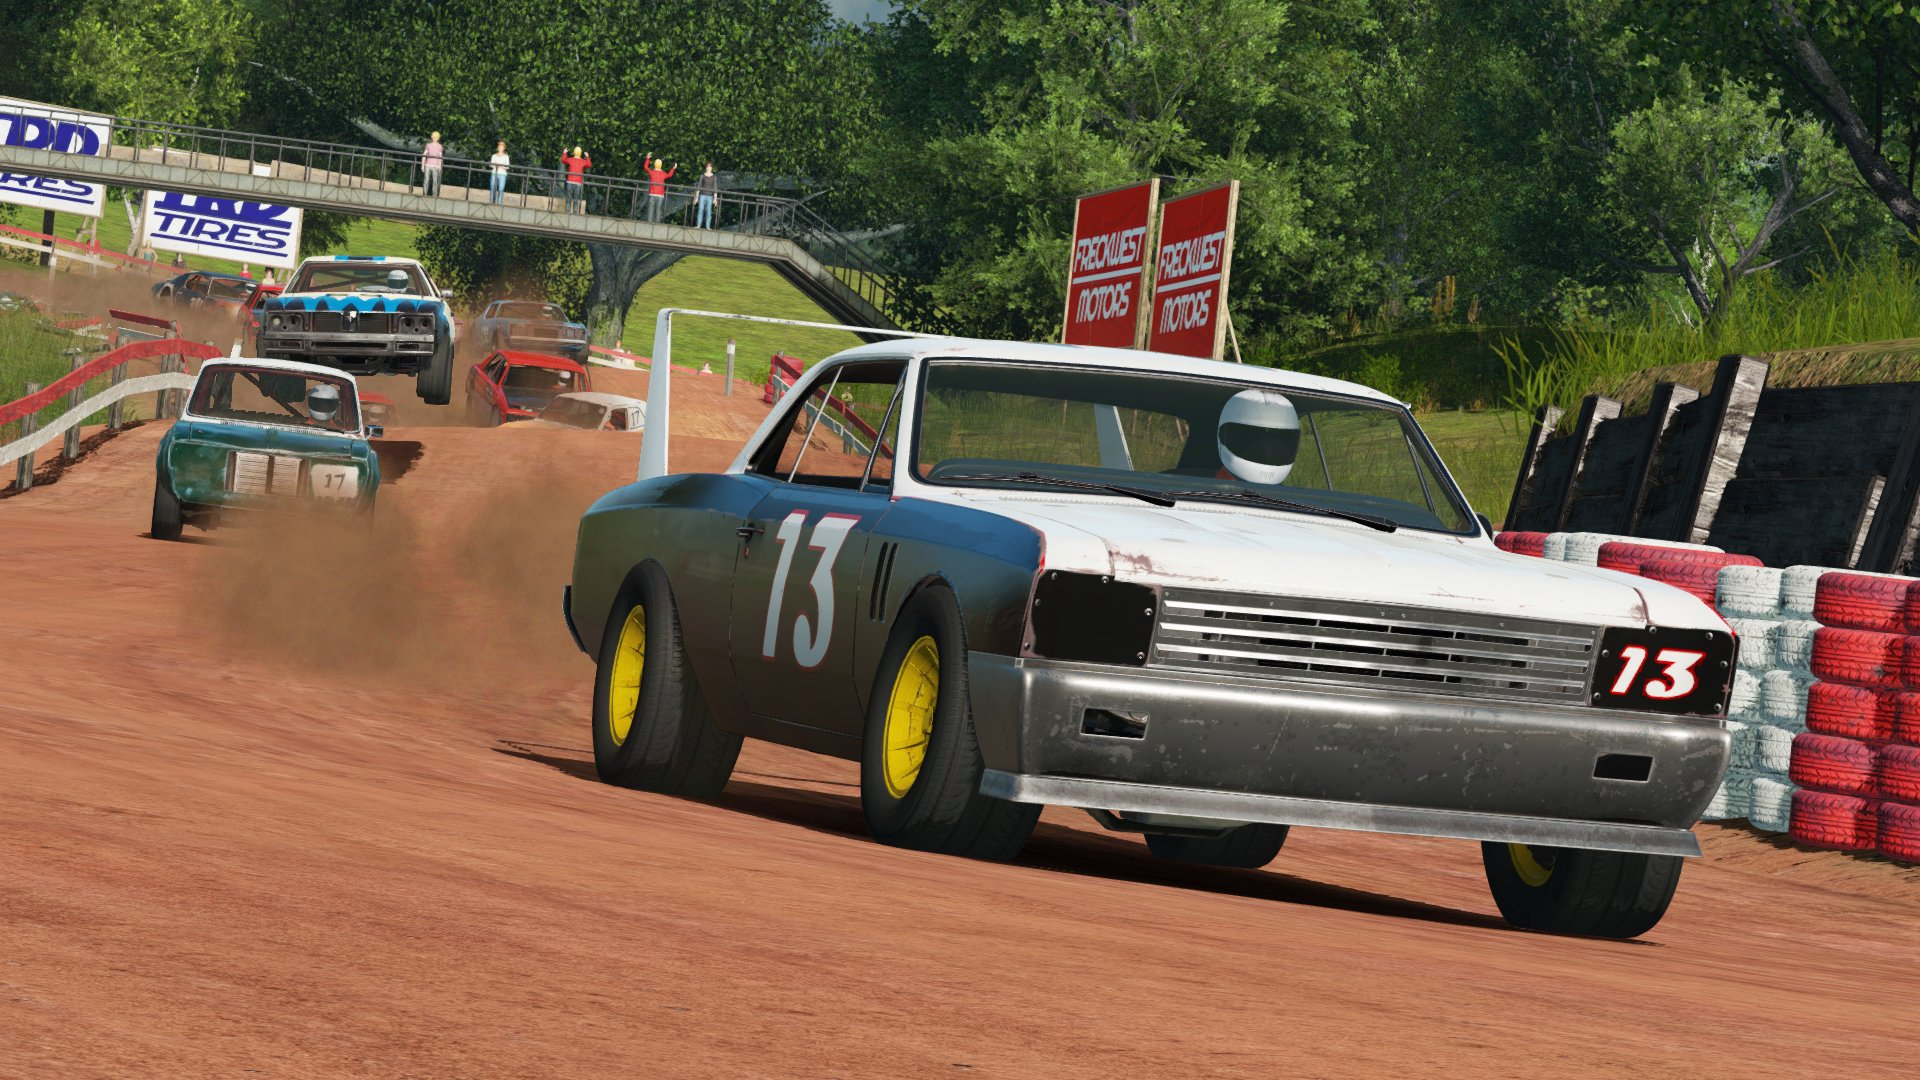 Next Car Game Wreckfest - June 2017 Update 3.jpg